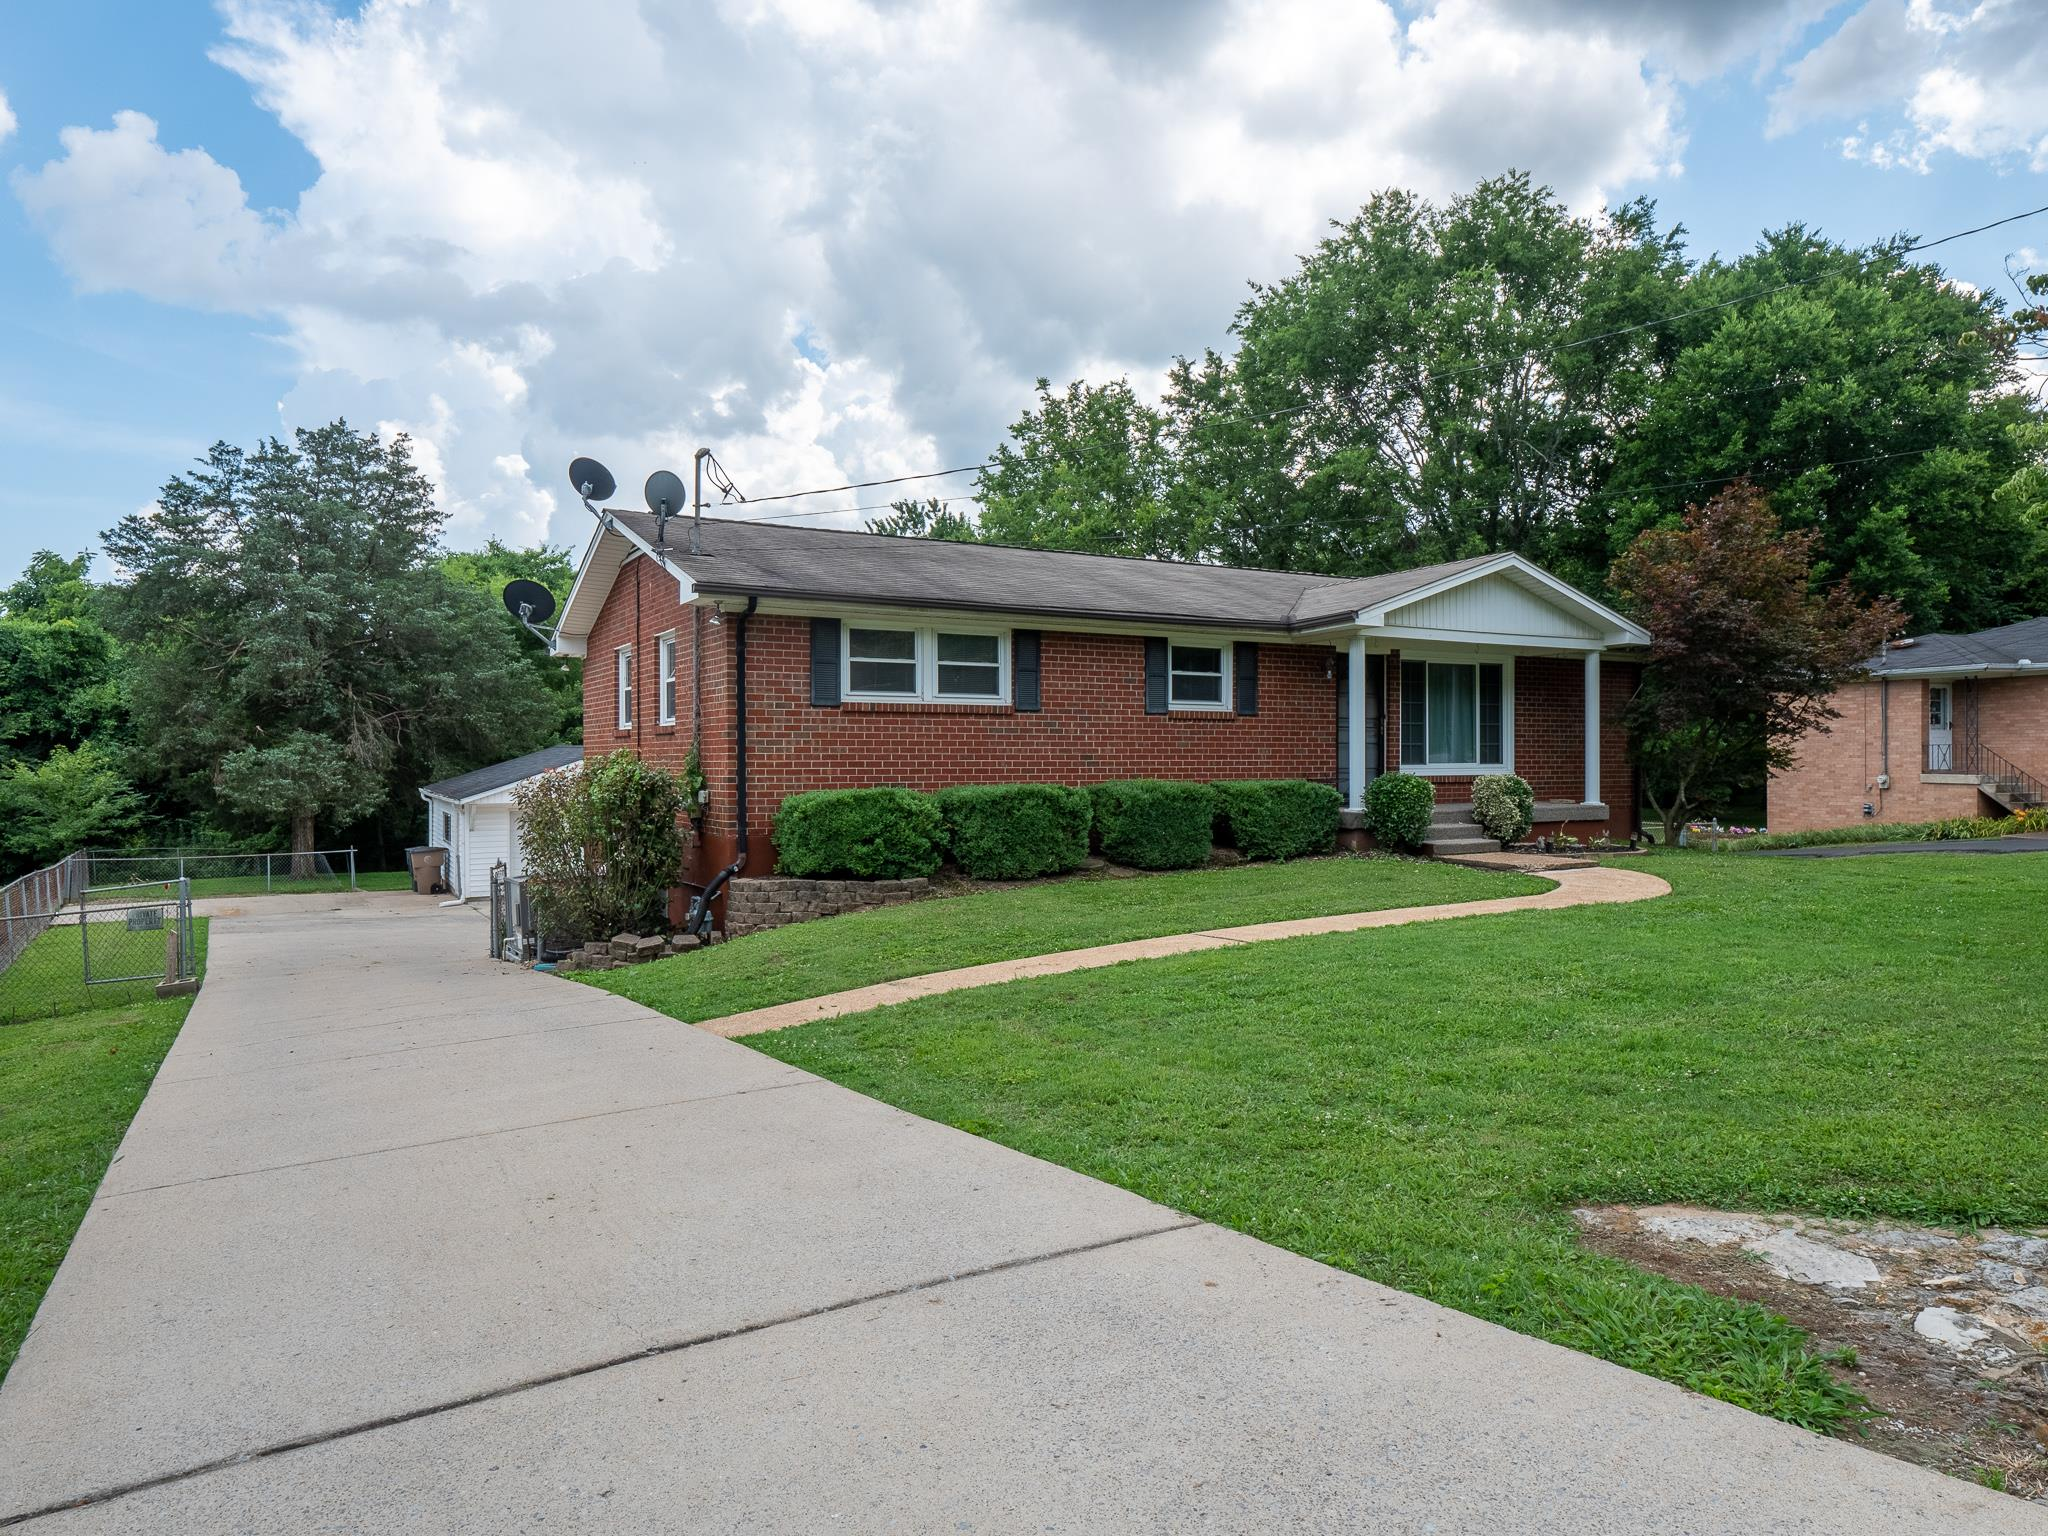 153 Lake Park Dr, Nashville, TN 37211 - Nashville, TN real estate listing